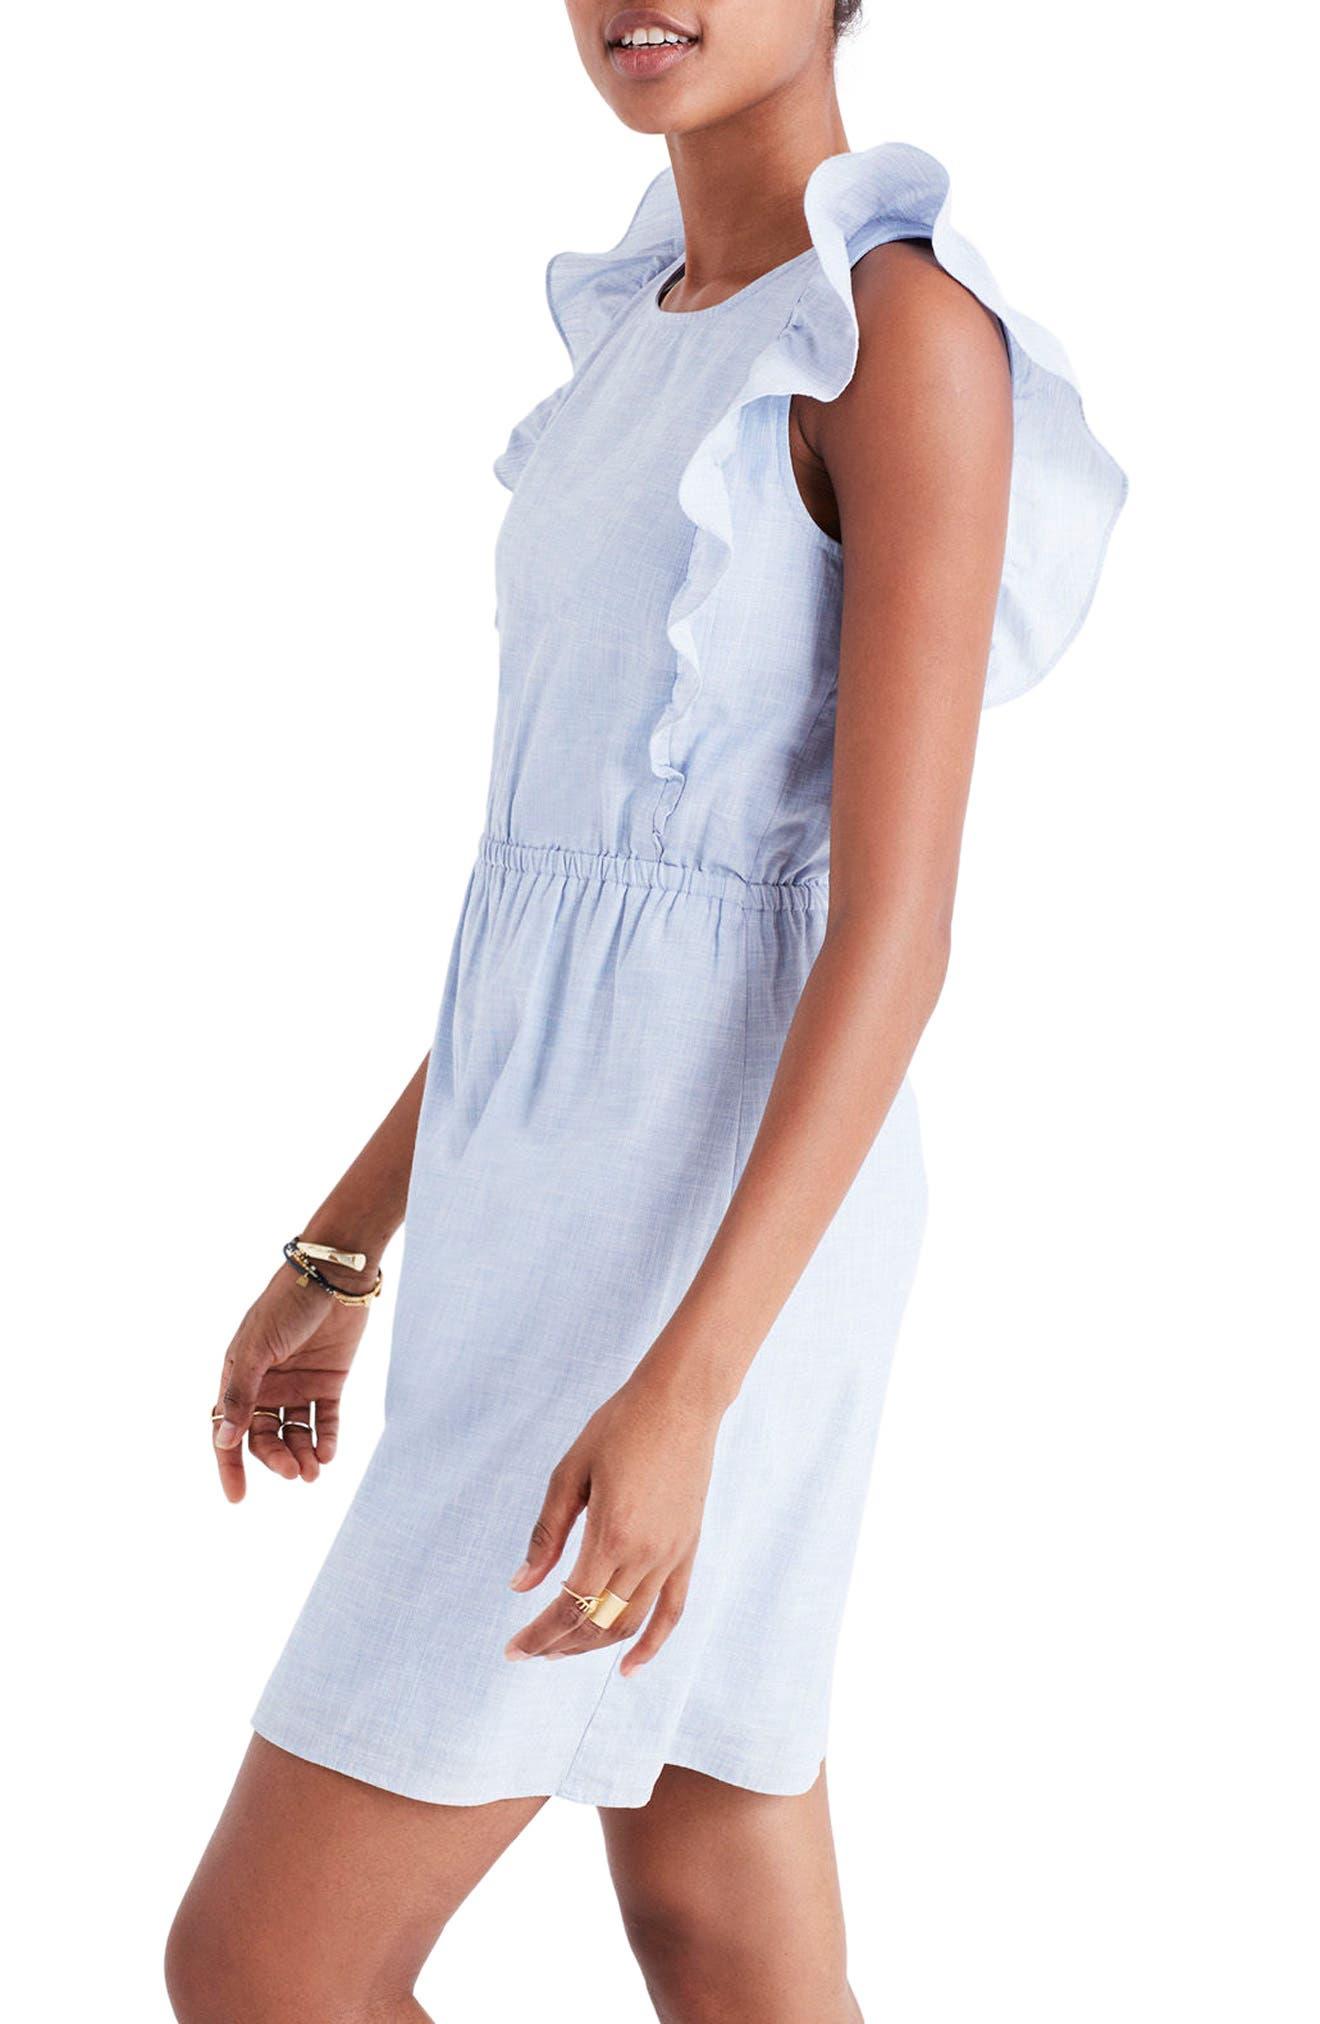 Bellflower Ruffle Dress,                             Main thumbnail 1, color,                             Craft Blue